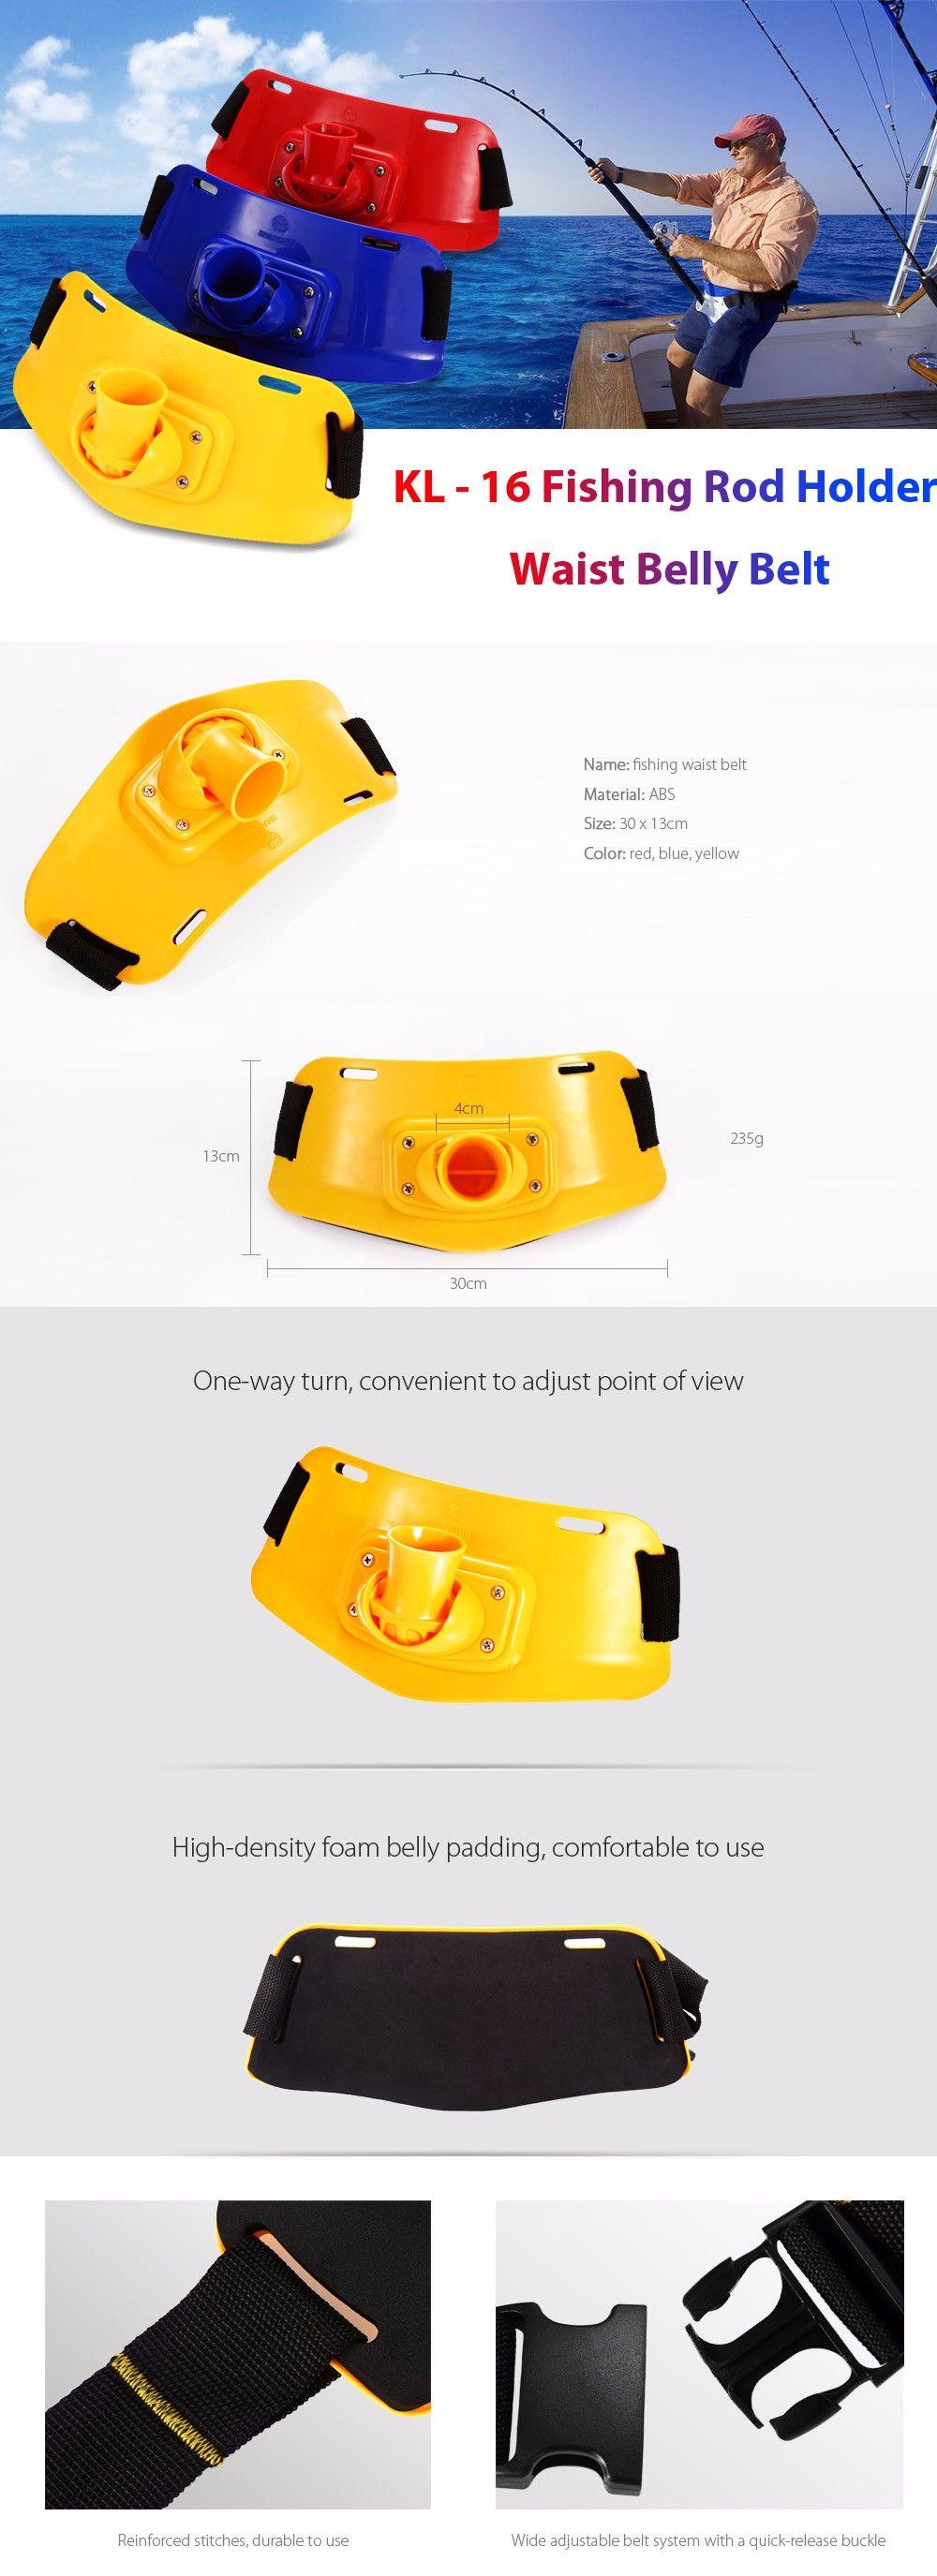 KL - 16 Portable ABS Fishing Rod Holder Waist Belly Belt for Fisherman